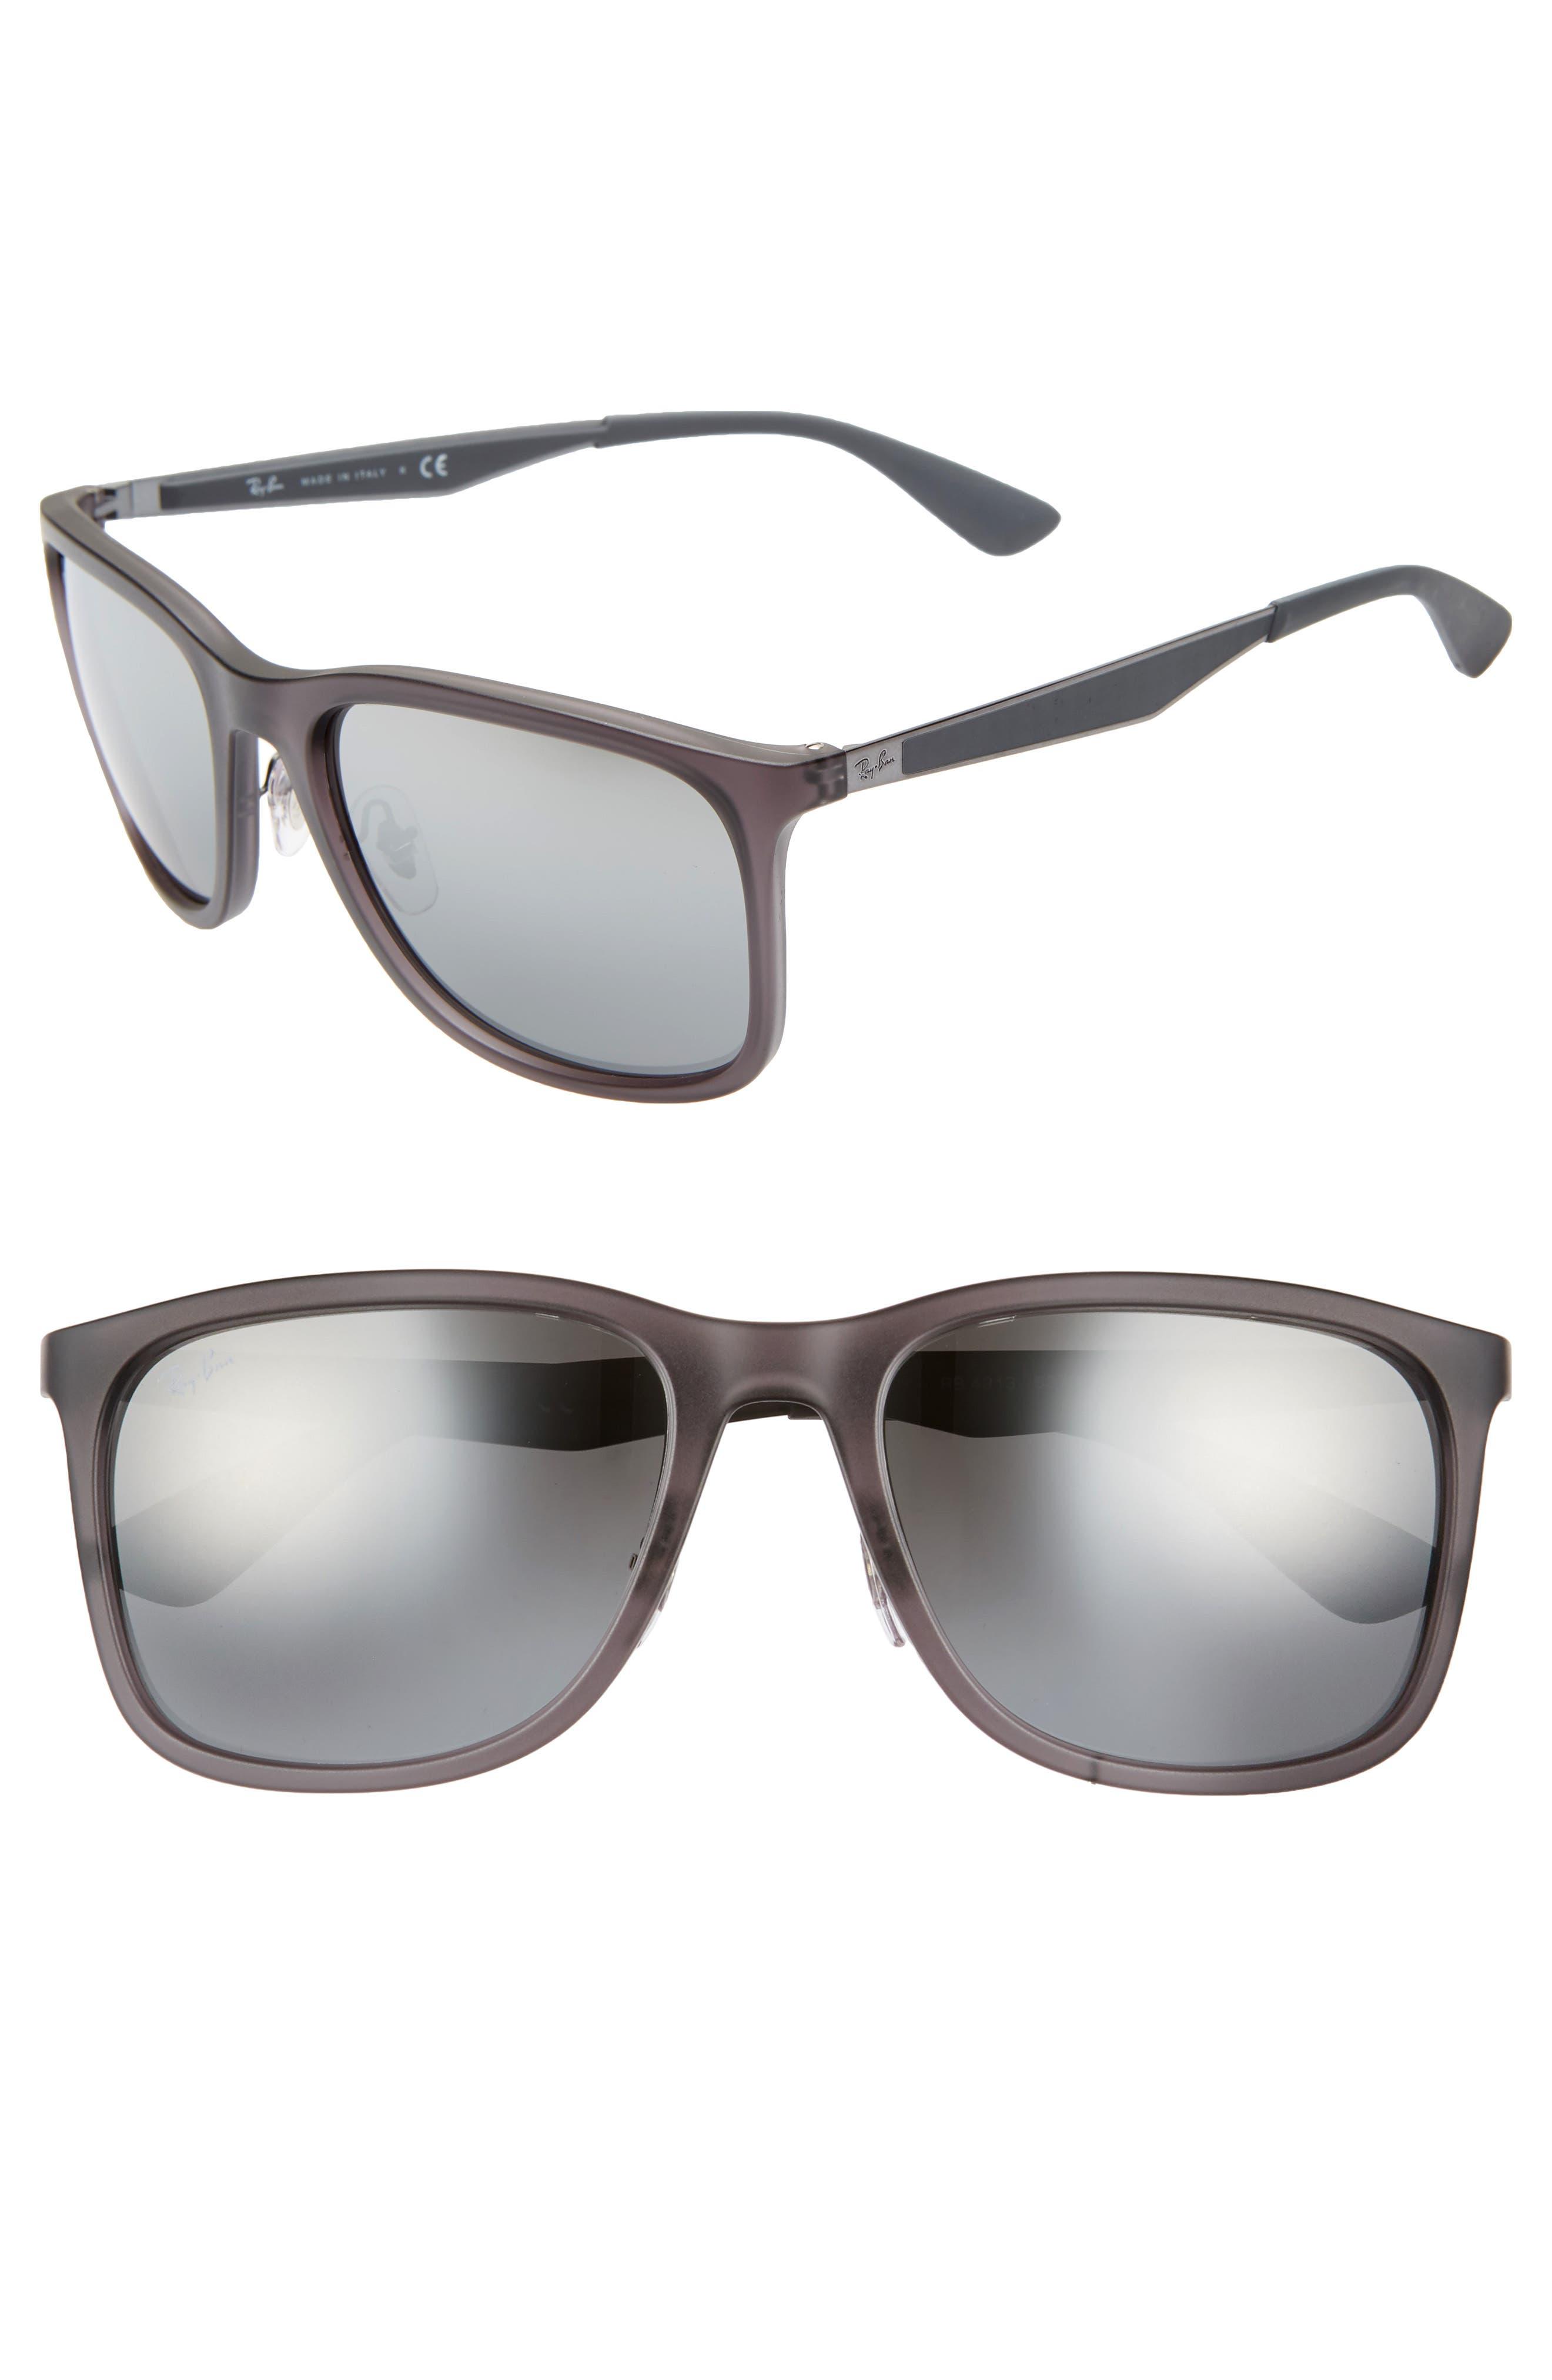 Ray-Ban 5m Square Sunglasses -